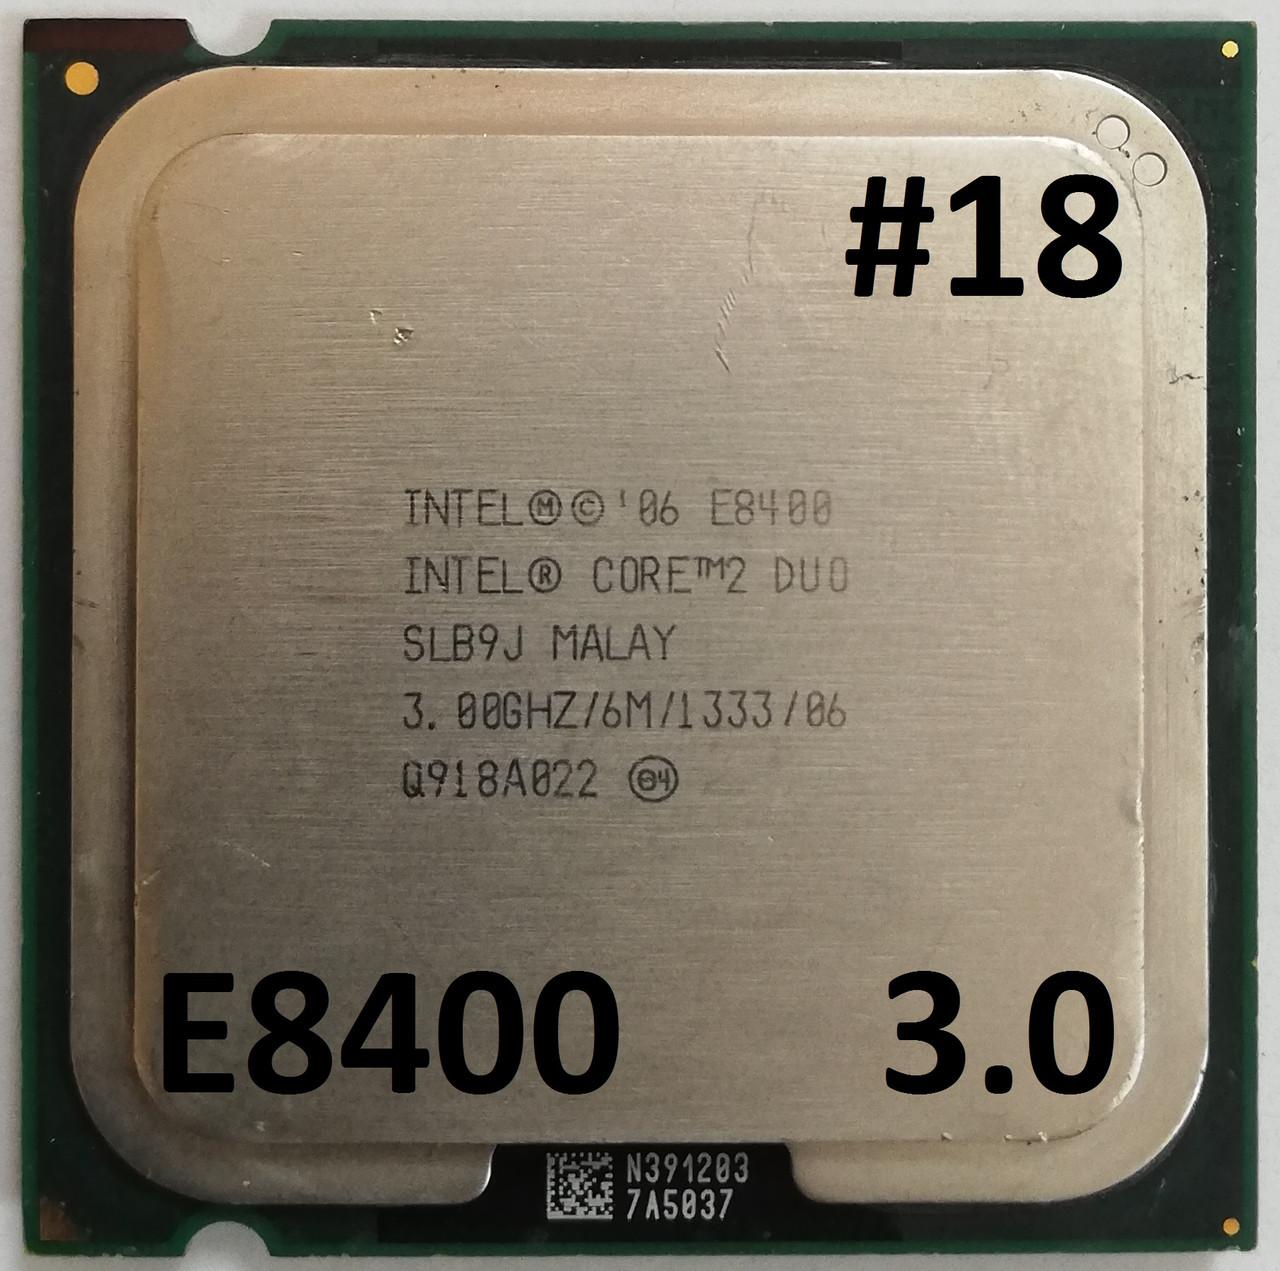 Процессор ЛОТ#18 Intel® Core™2 Duo E8400 SLB9J 3.00GHz 6M Cache 1333 MHz FSB Socket 775 Б/У